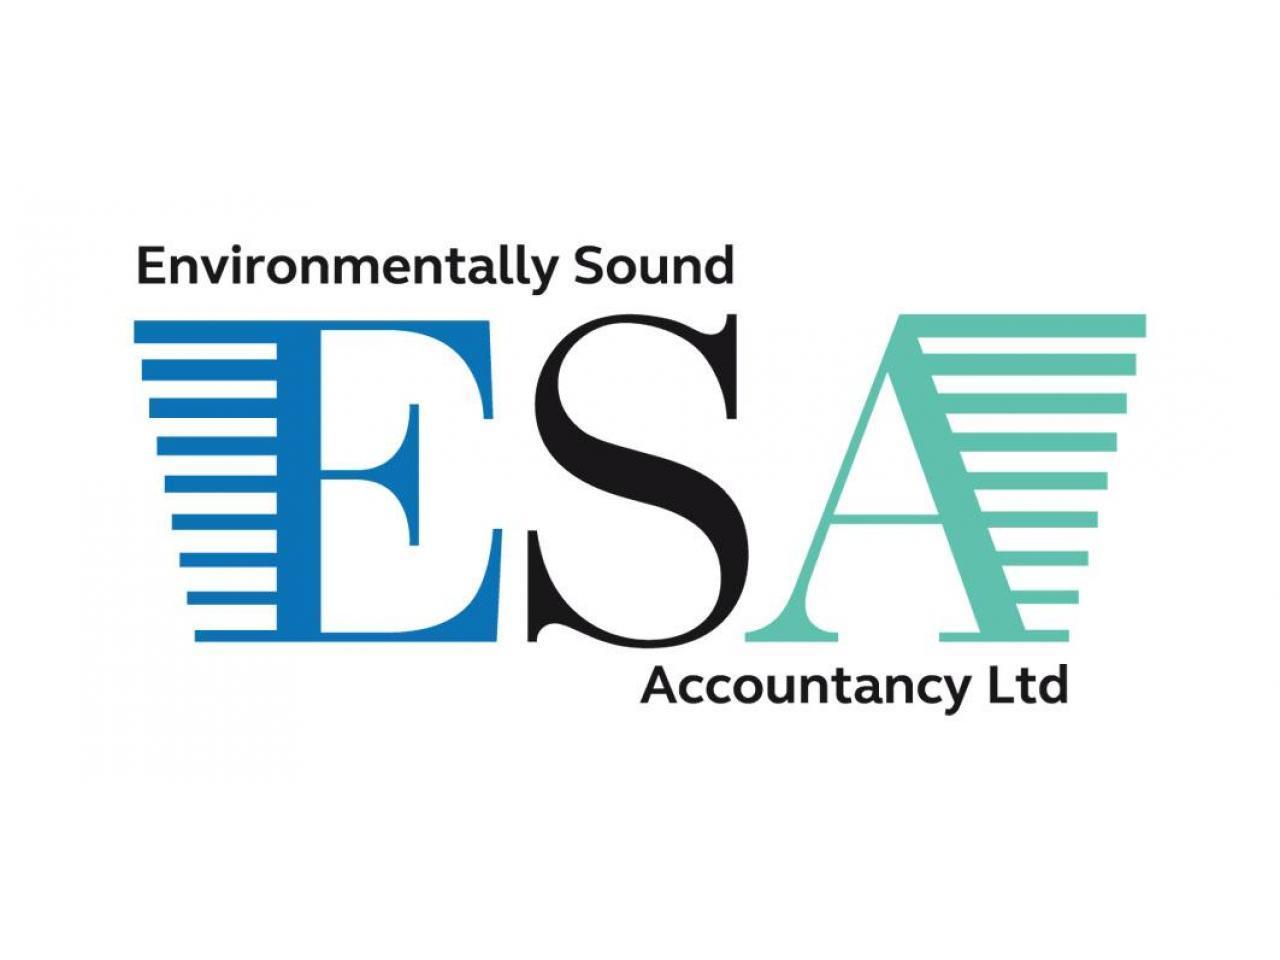 ESA Ltd - Smart accounting saves money - 1